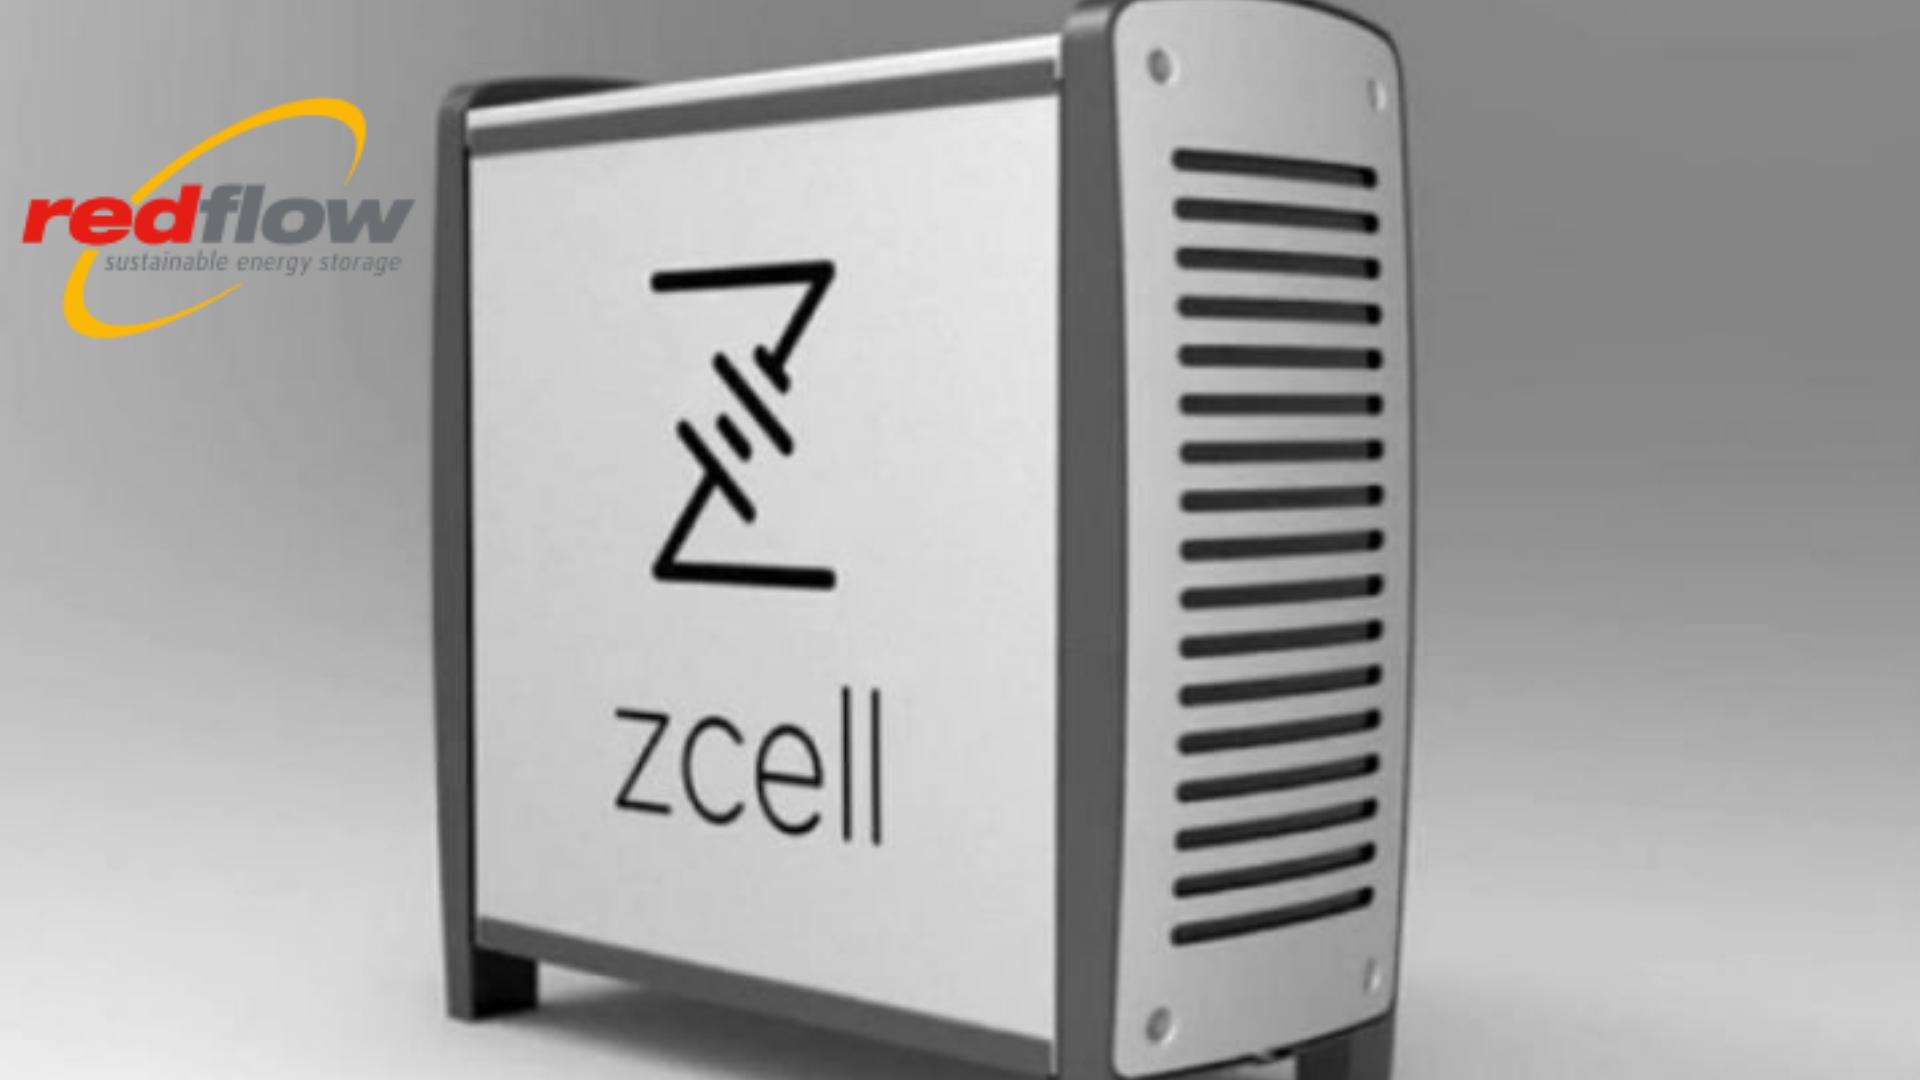 redflow zcell battery